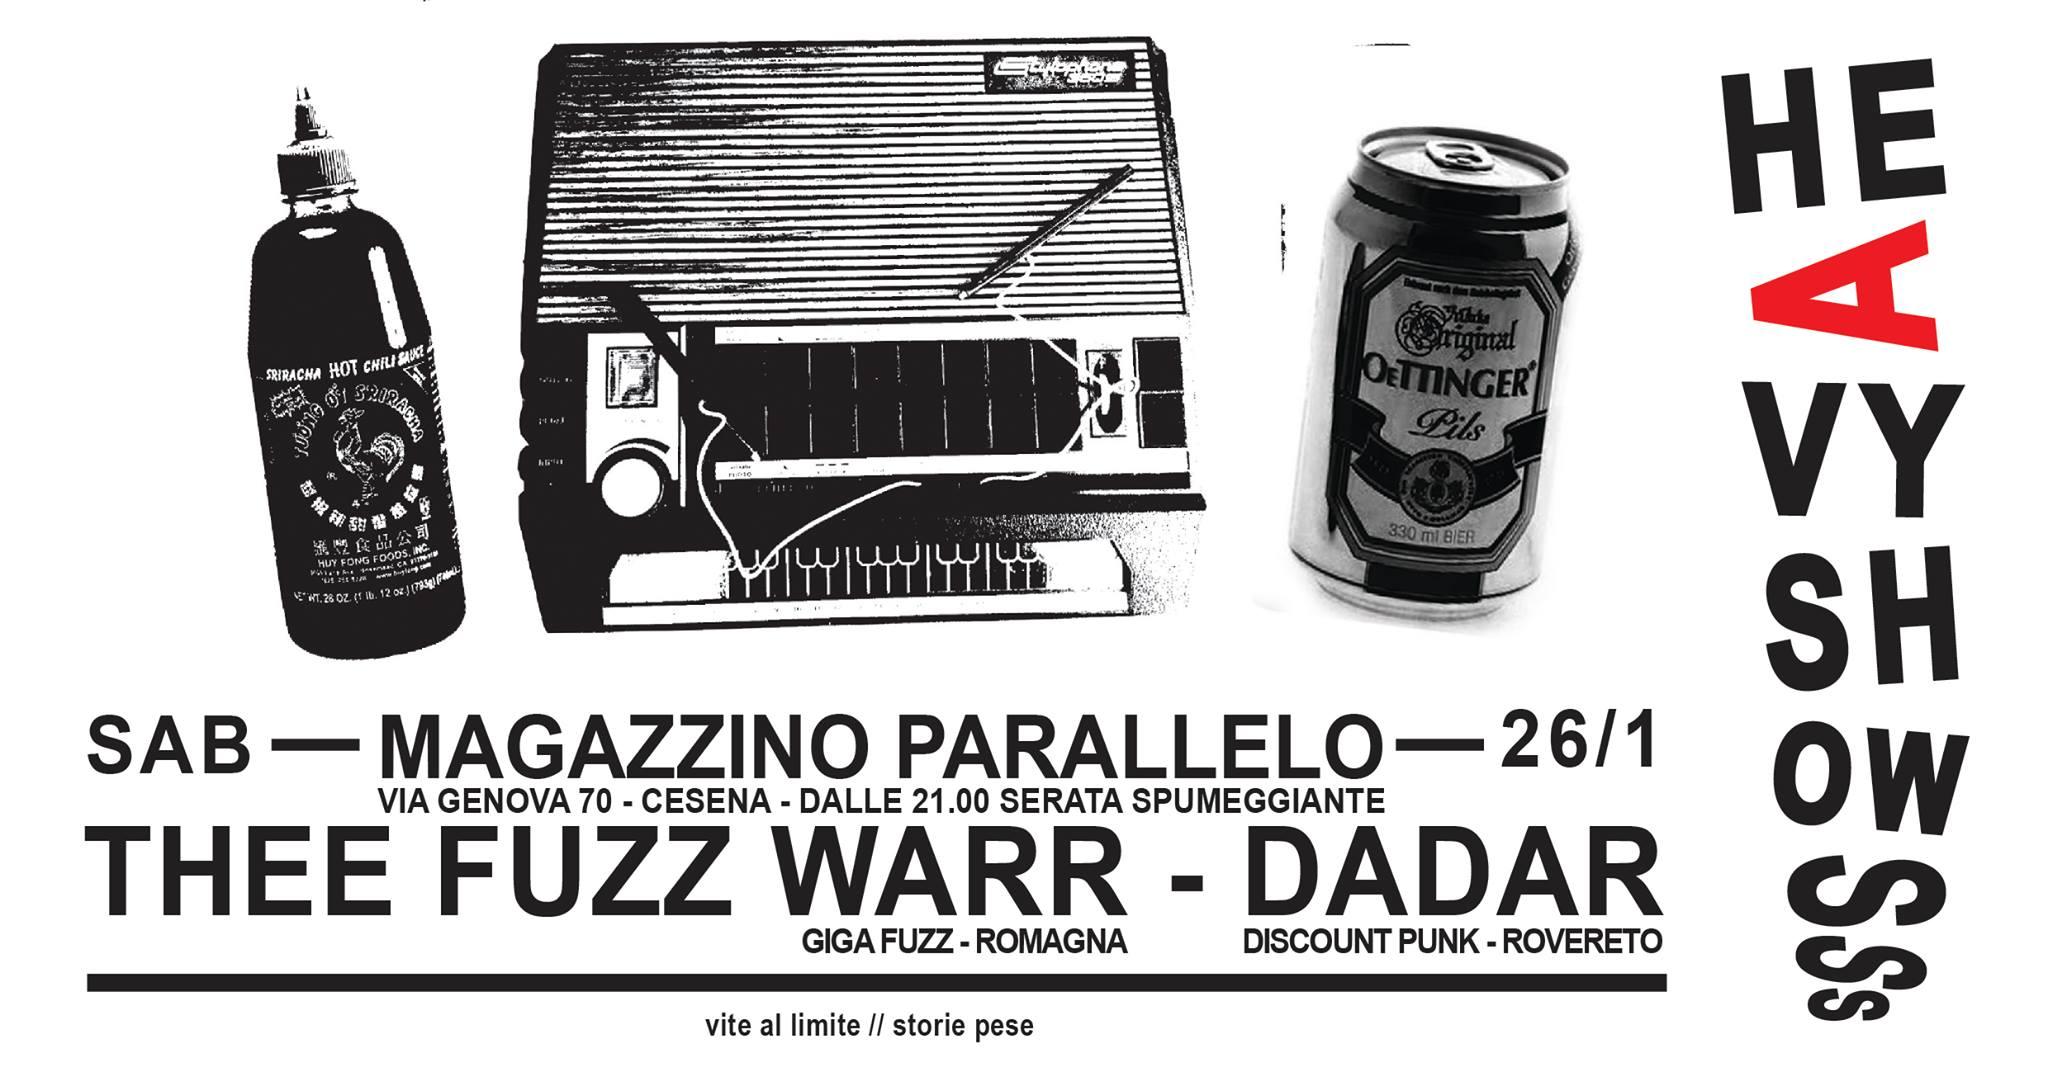 Thee Fuzz Warr ⌁ Dadar / Heavy Shows / at Magazzino Parallelo